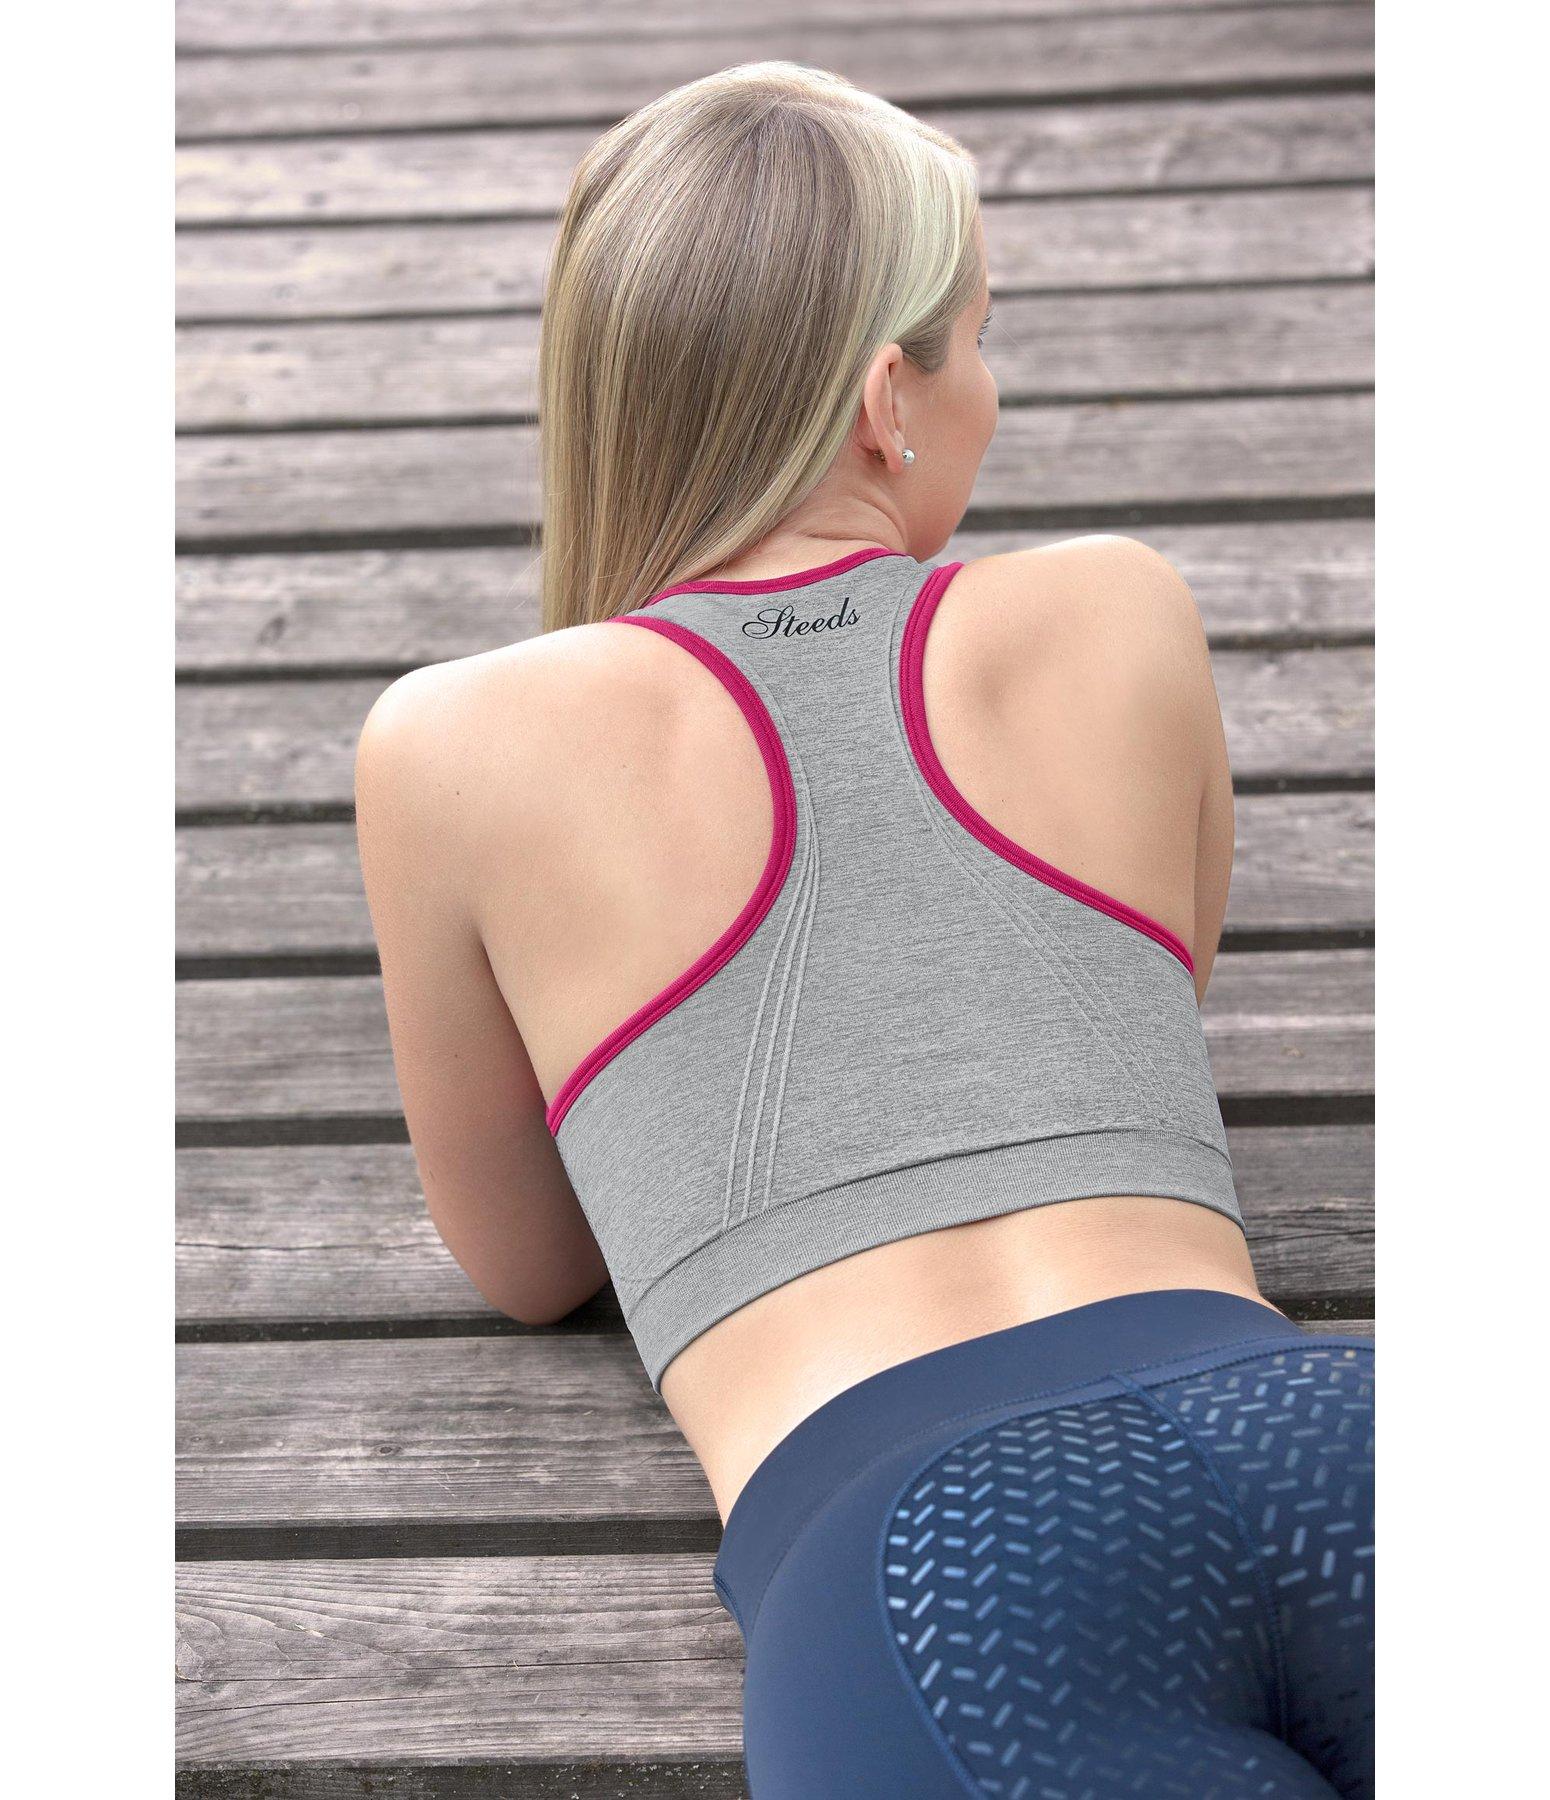 608be8f8f186a Sports Bra Indy - Underwear - Kramer Equestrian